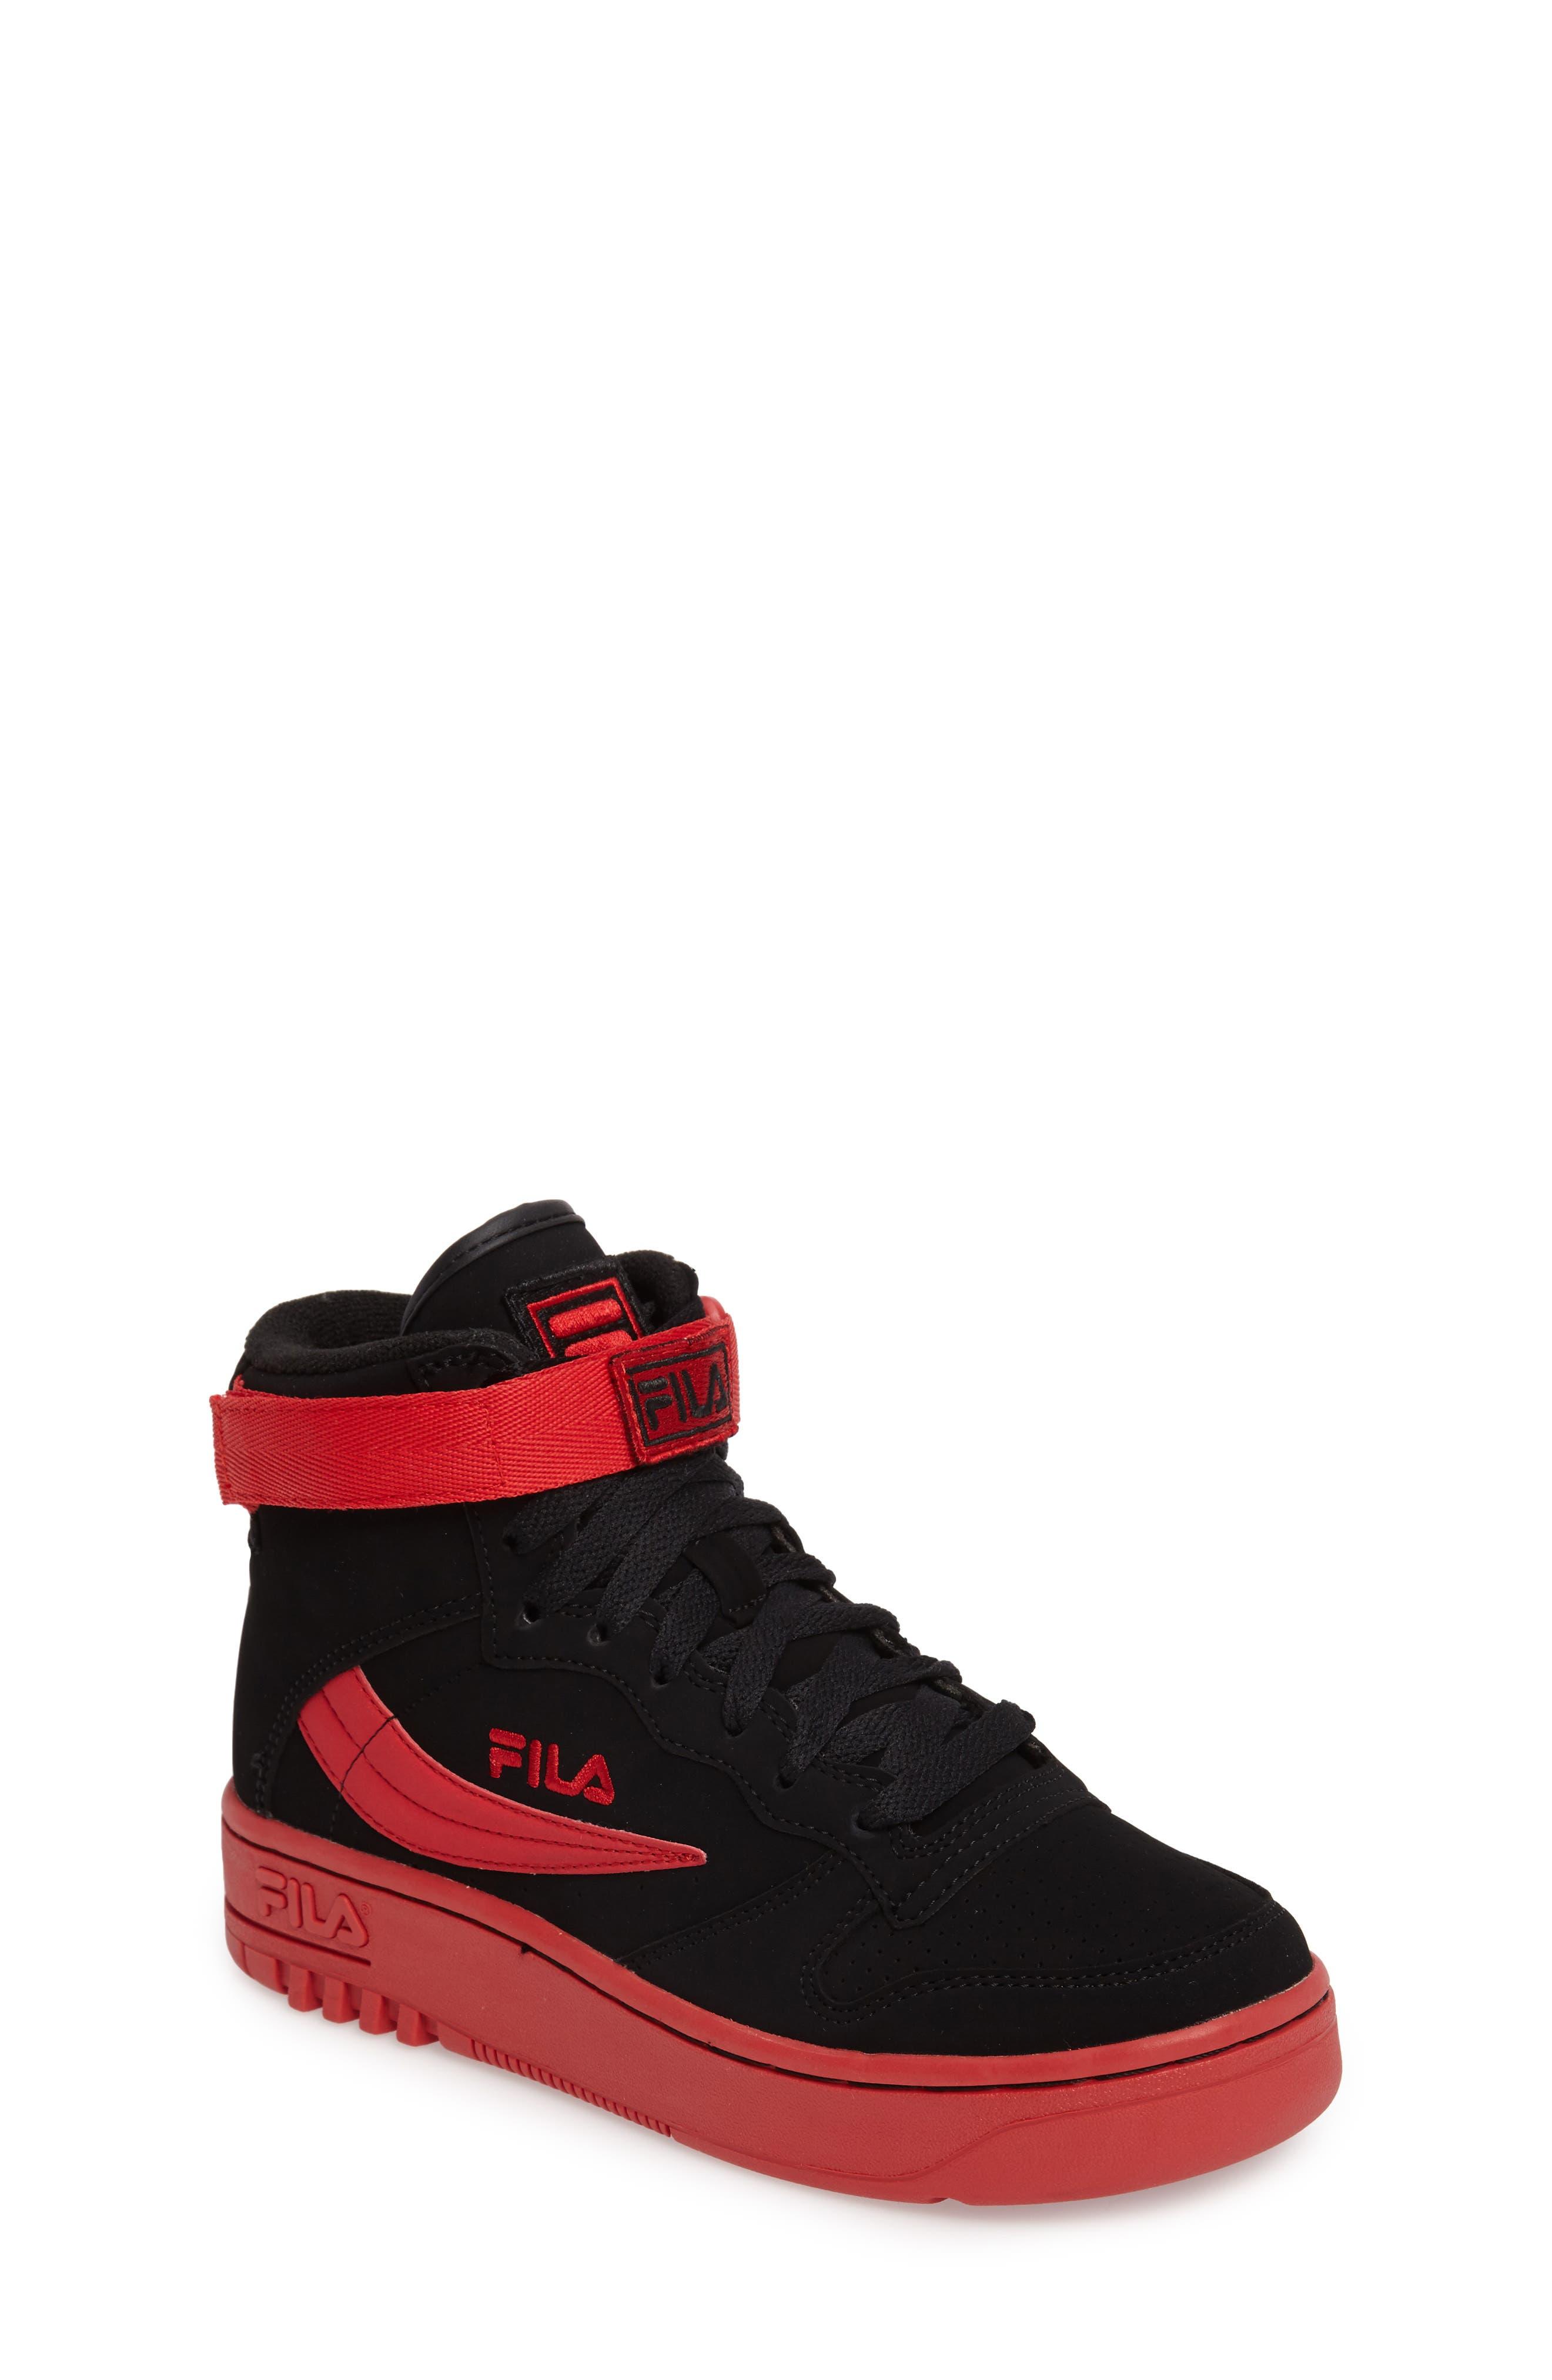 USA FX-100 High Top Sneaker,                             Alternate thumbnail 2, color,                             001